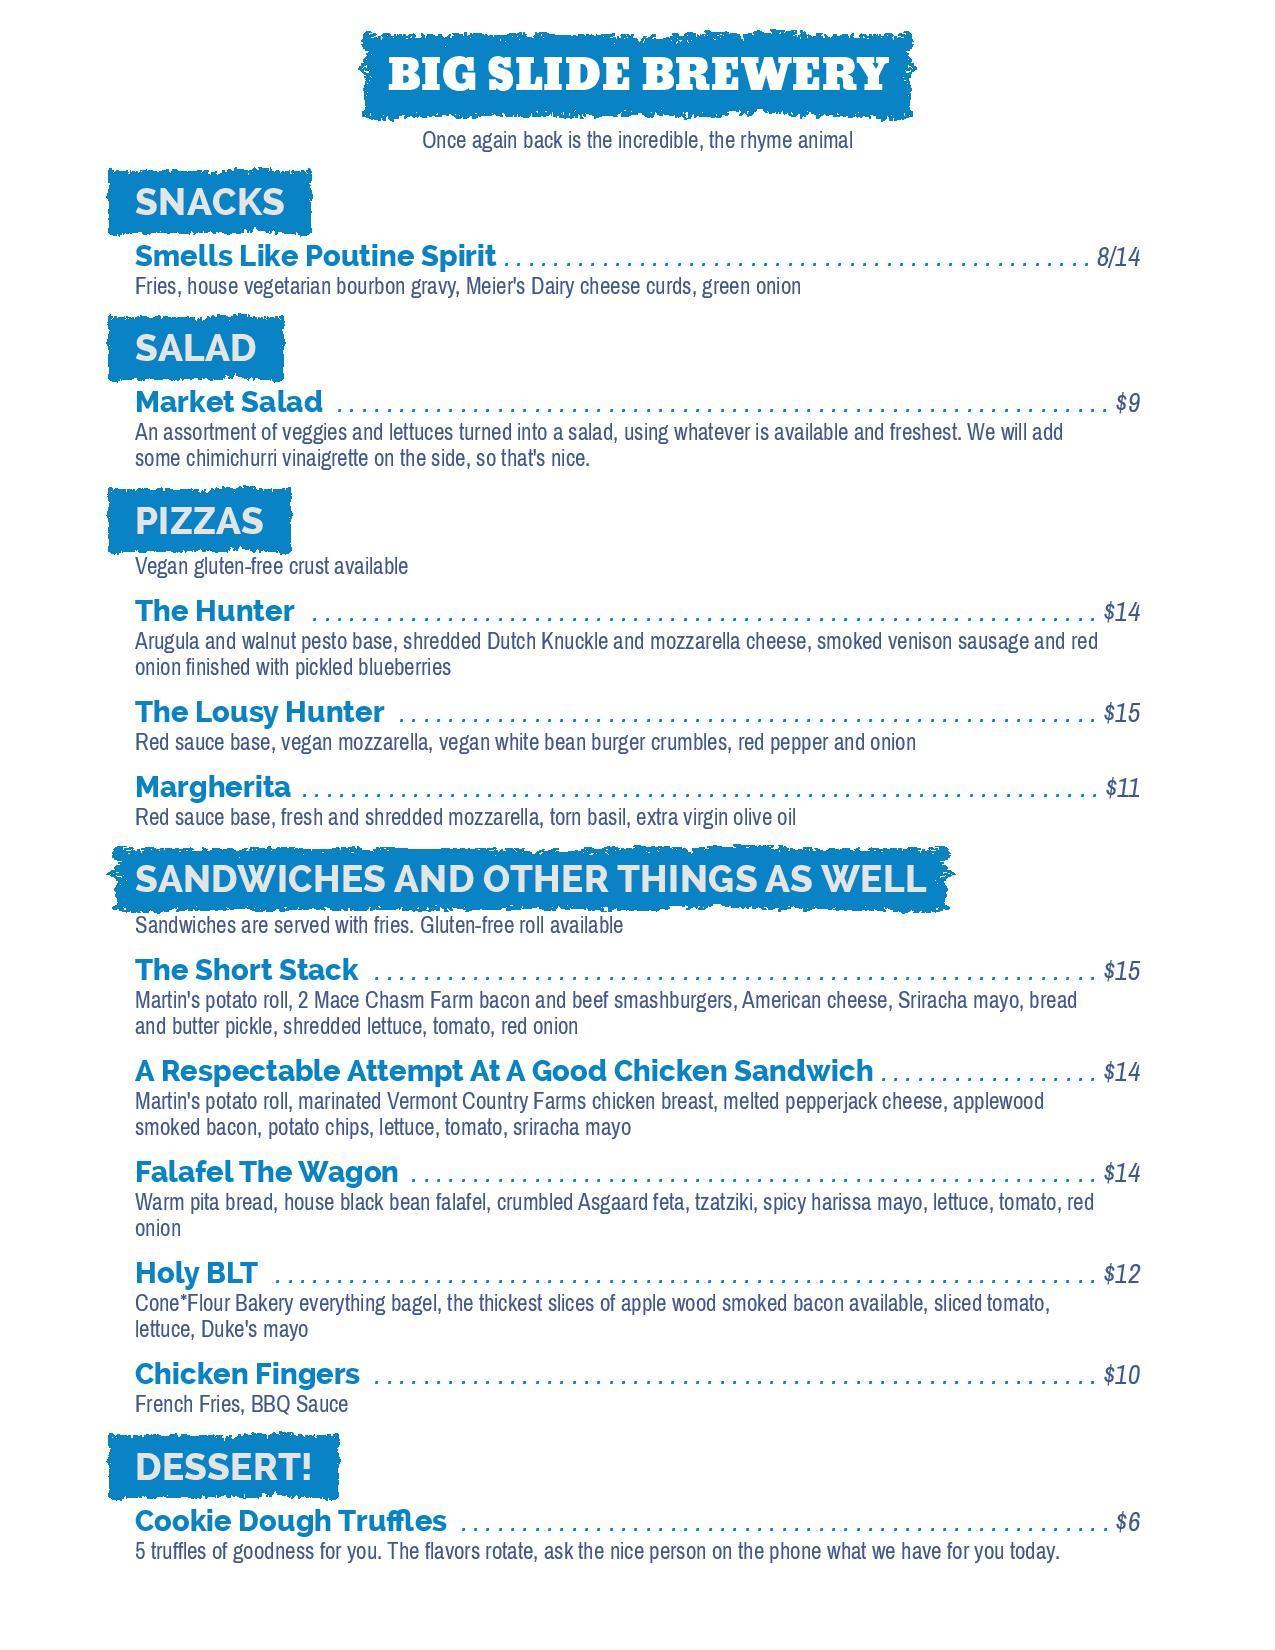 Bsb April 20 21 Menu Page 001